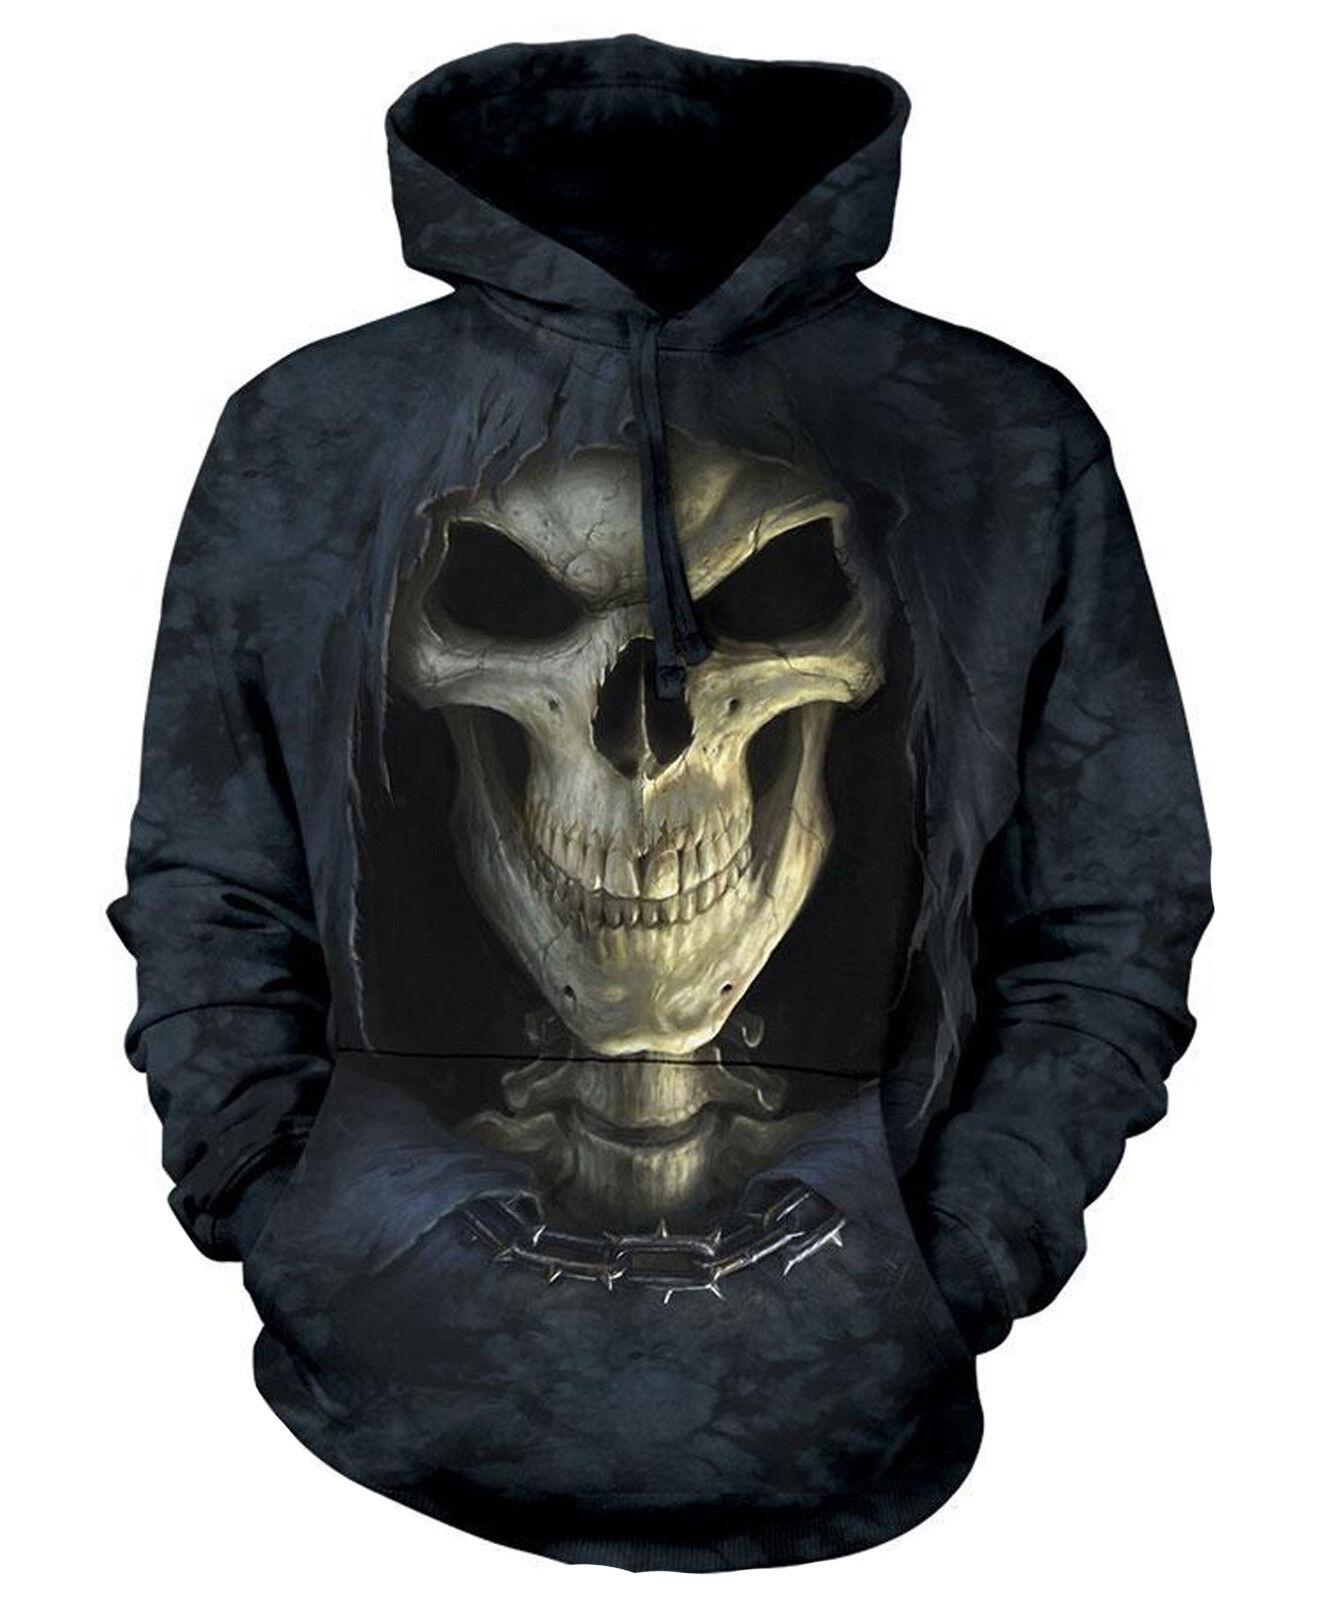 5078 The Mountain Hoodie Kapuzenpulli BIG FACE DEATH Schädel Skull